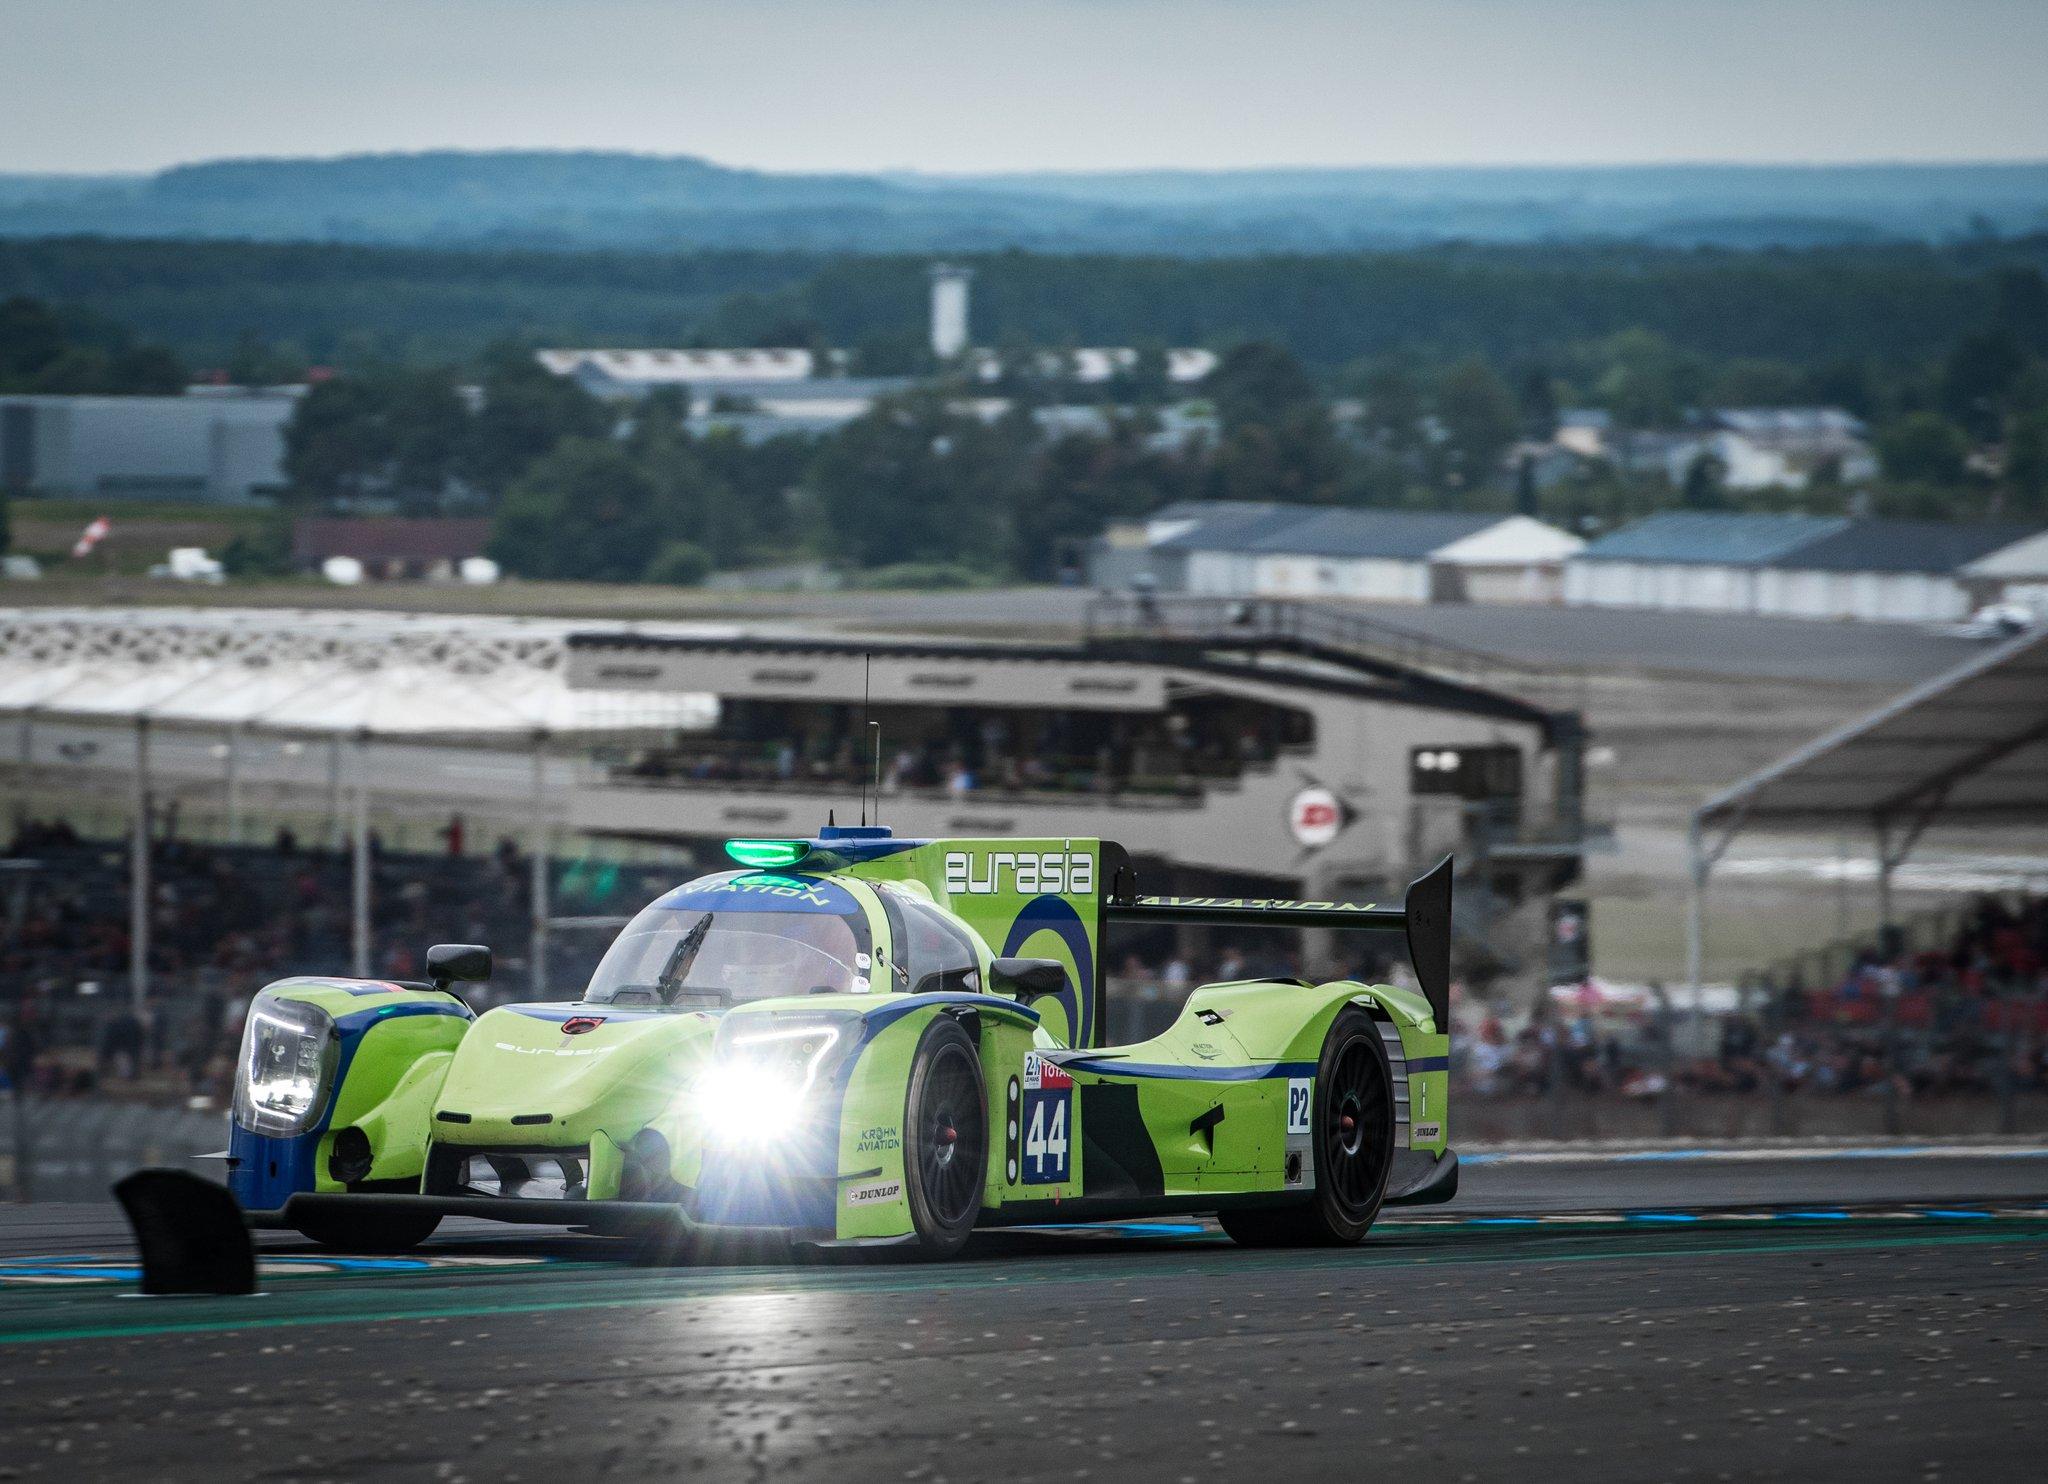 24 Horas de Le Mans 2018 - Página 3 Df14i1nWAAAmN6i